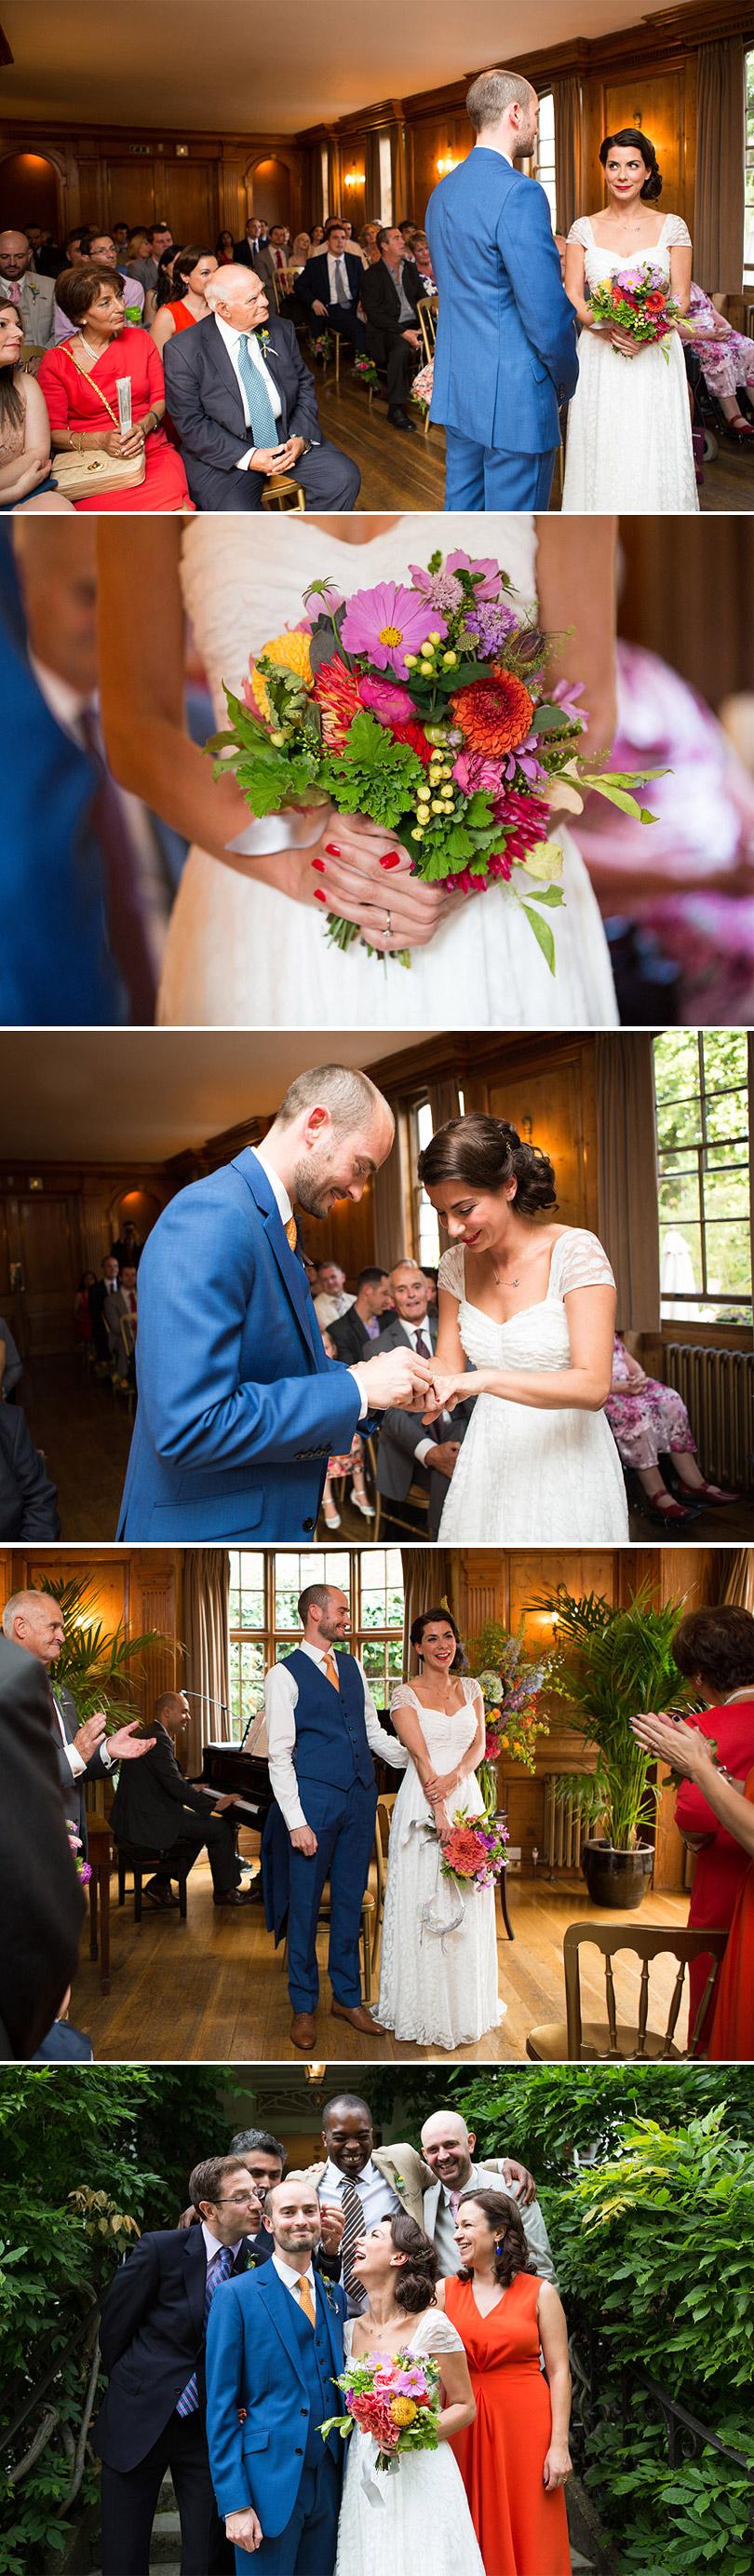 Burgh-House-&-The-Swan-at-The-Globe-Wedding-011.jpg